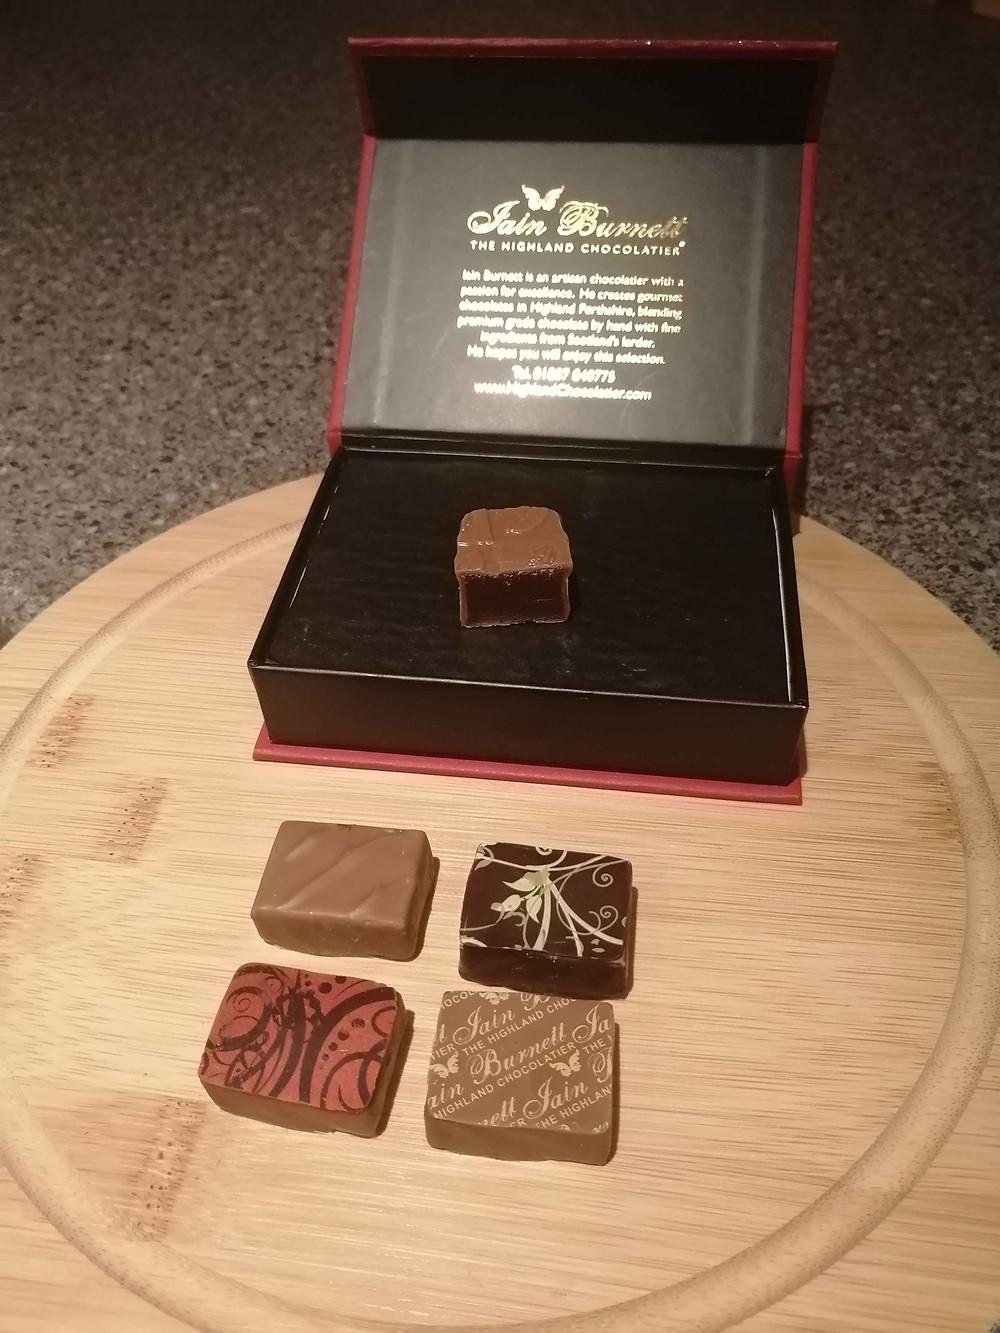 a box of Iain Burnett's handmade chocolates